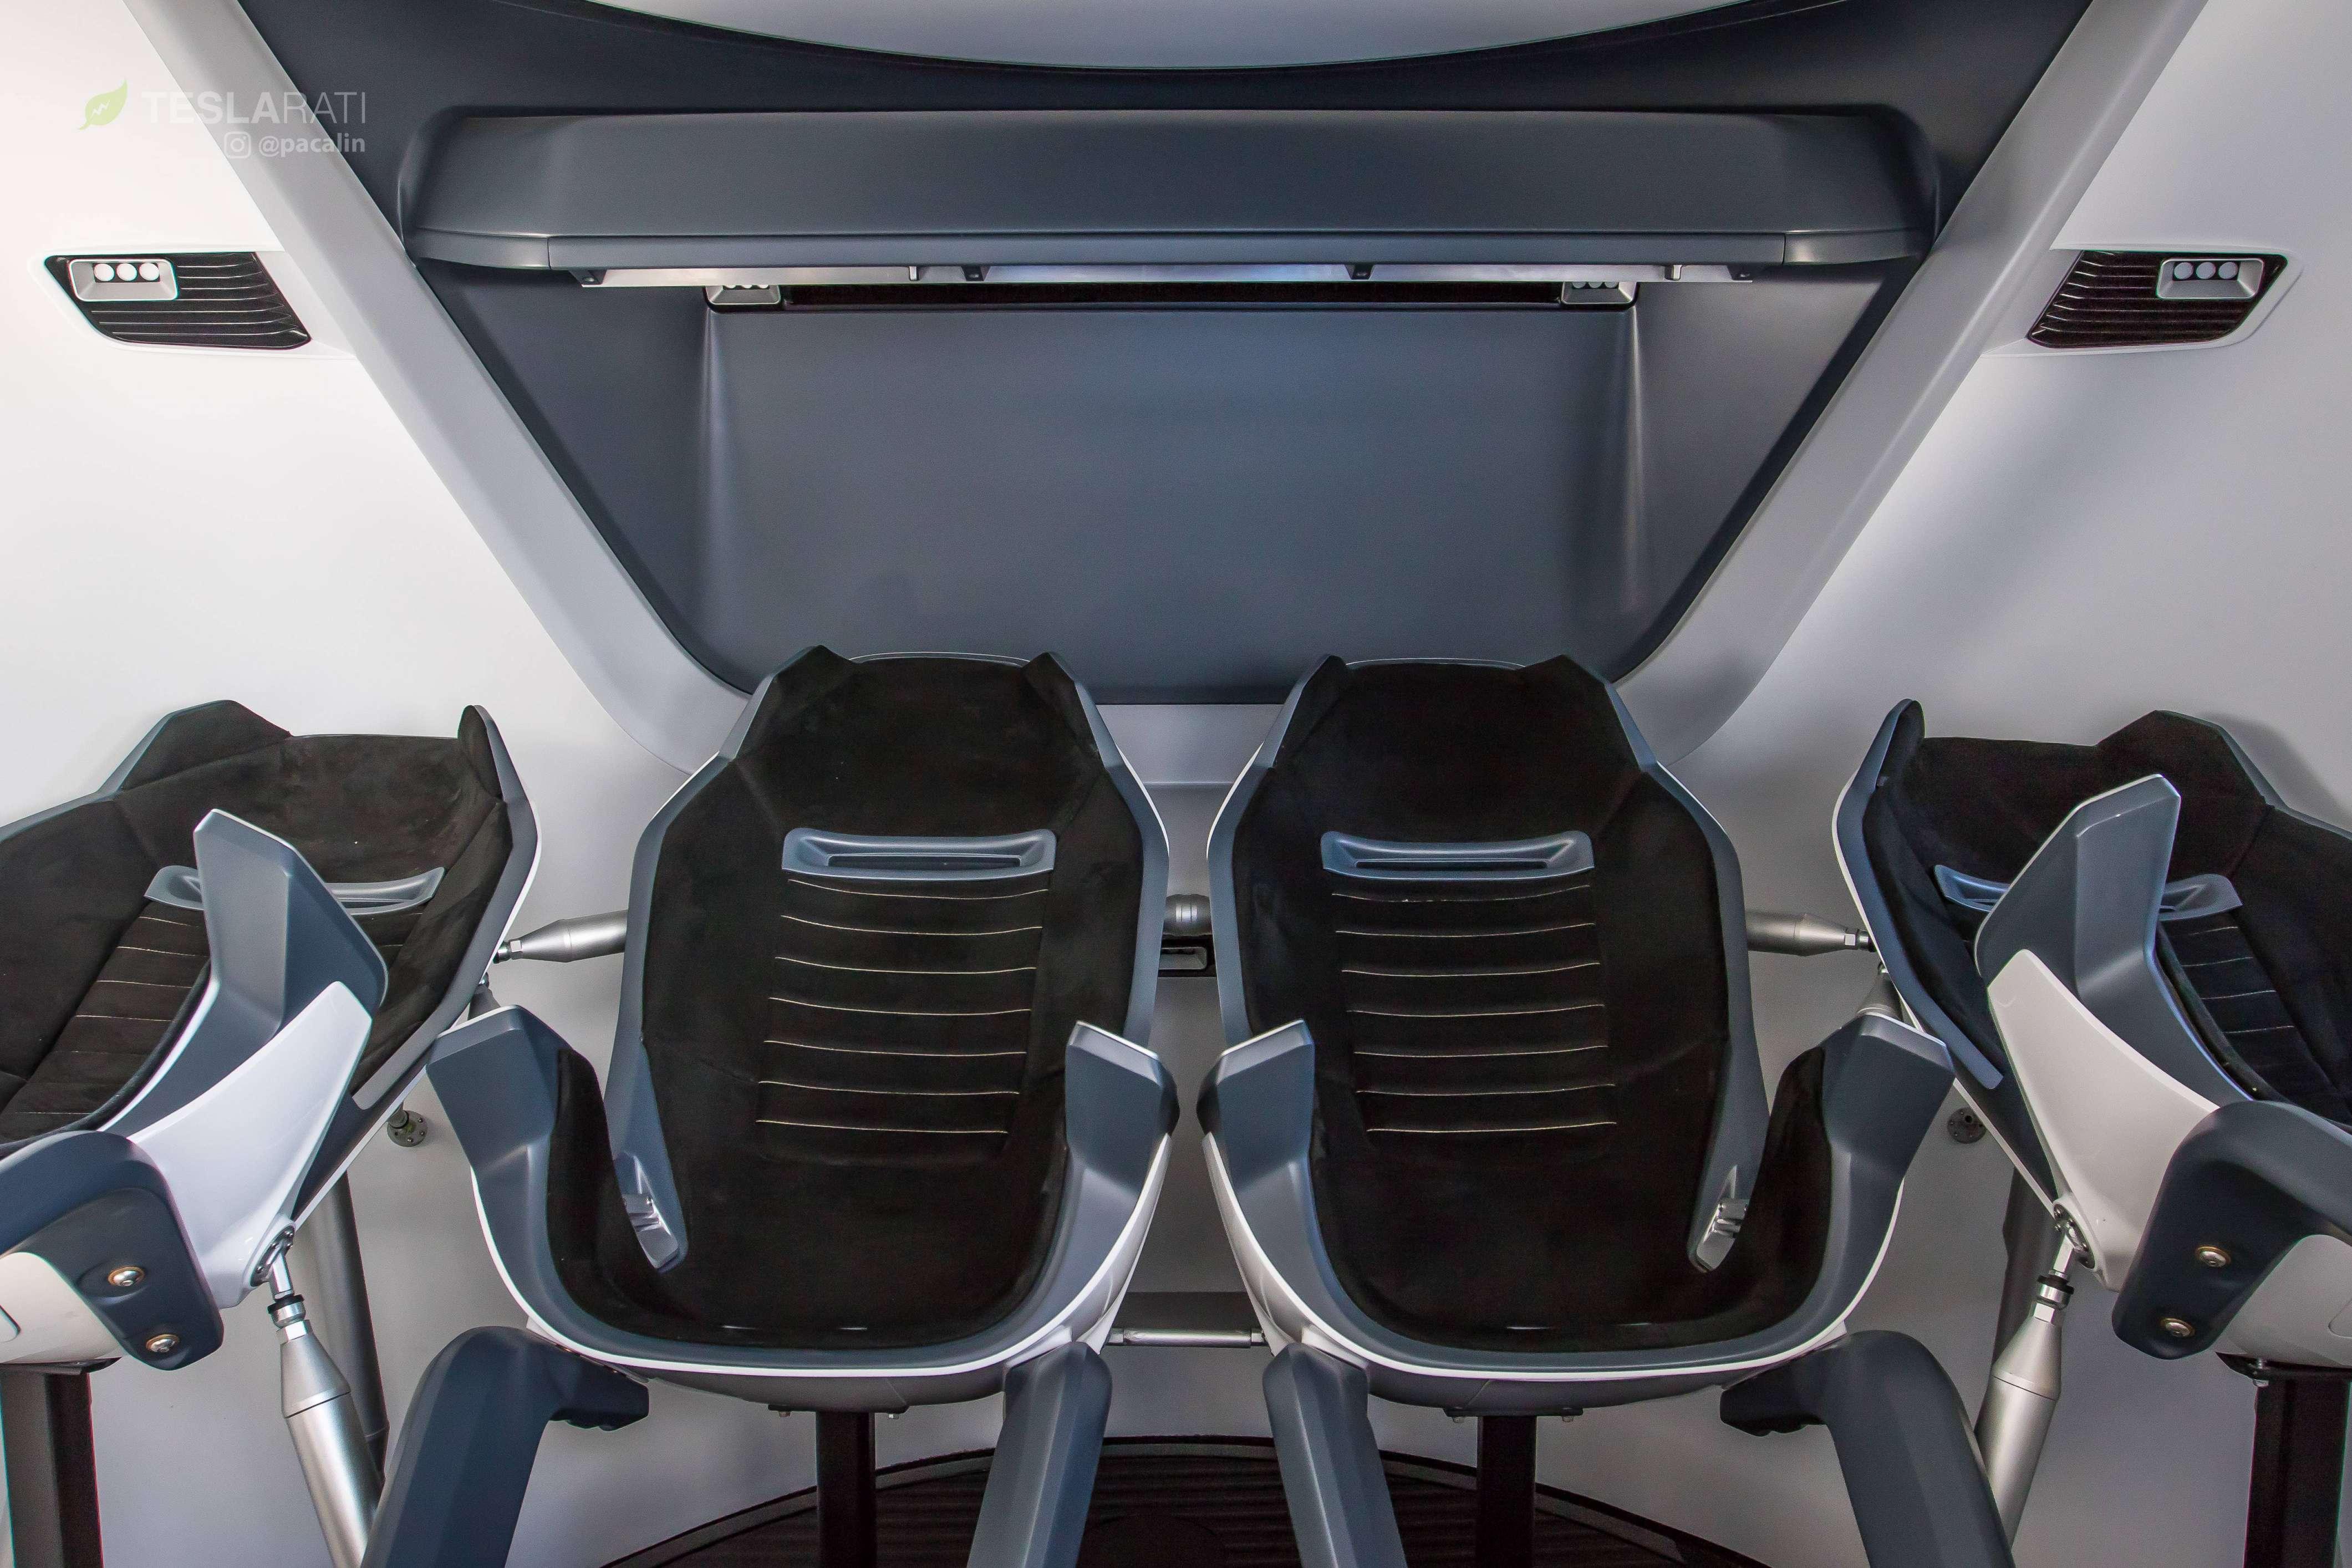 Crew Dragon simulator cabin 081318 (SpaceX) 3 (c)